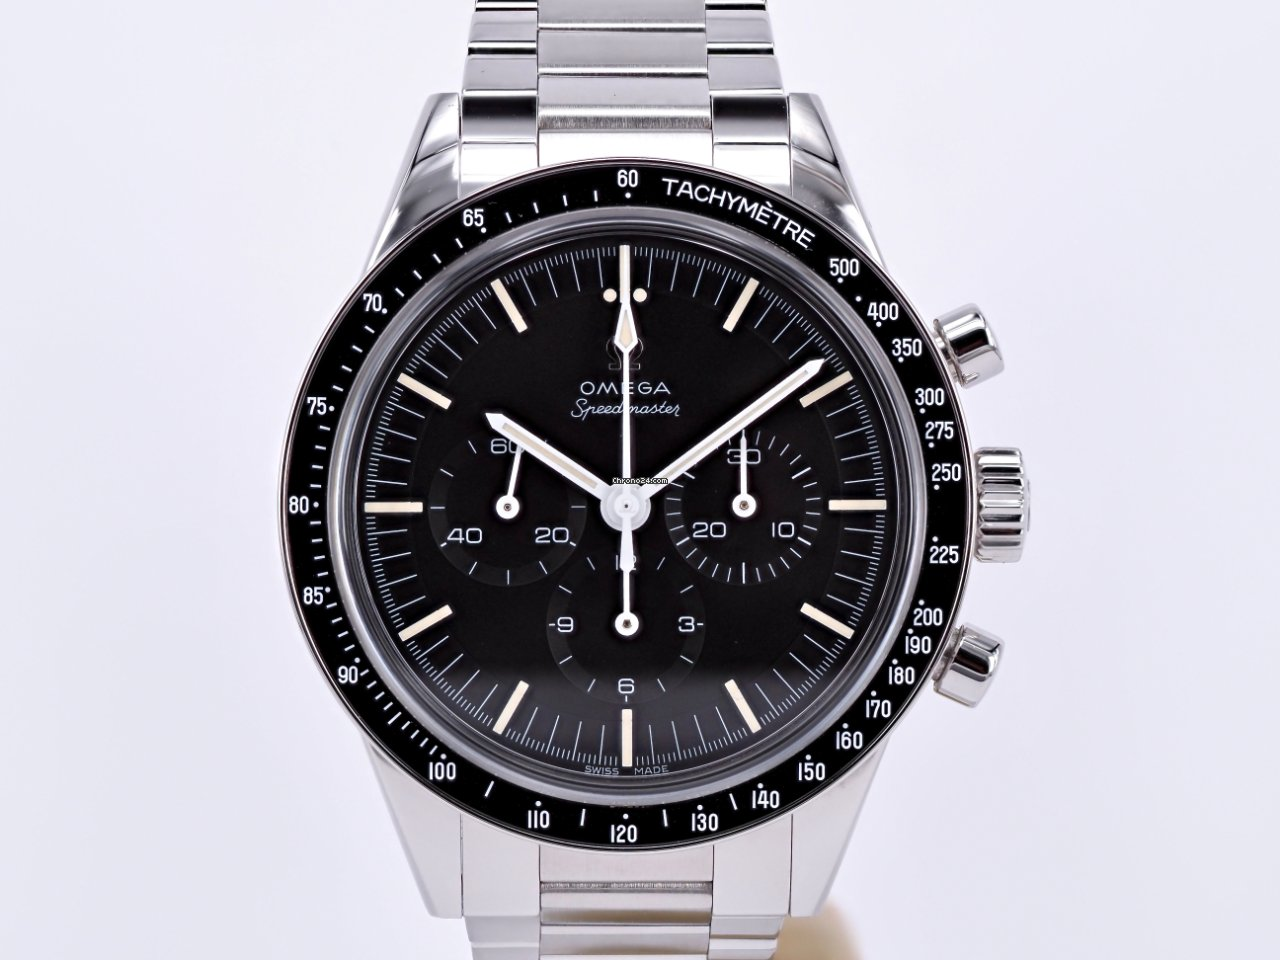 Omega Speedmaster Professional Moonwatch 311.30.40.30.01.001 2020 new